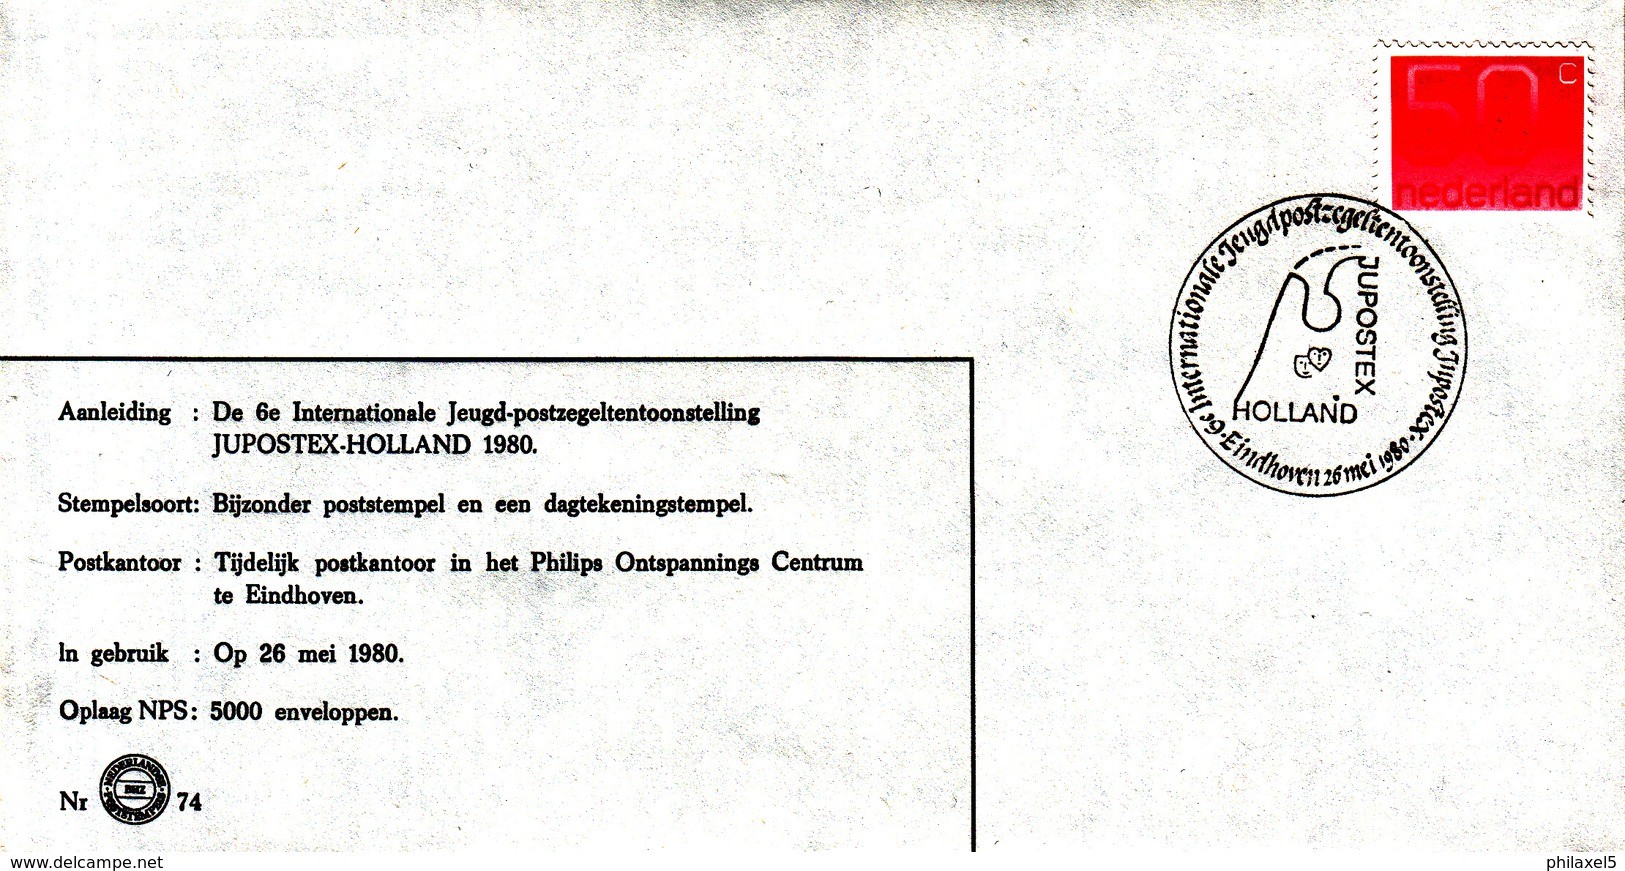 Nederland - 26 Mei 1980 - 6e Internationale Jeugd-postzegeltentoonstelling JUPOSTEX HOLLAND 1980 - Z 74 - Marcofilie - EMA (Print Machine)